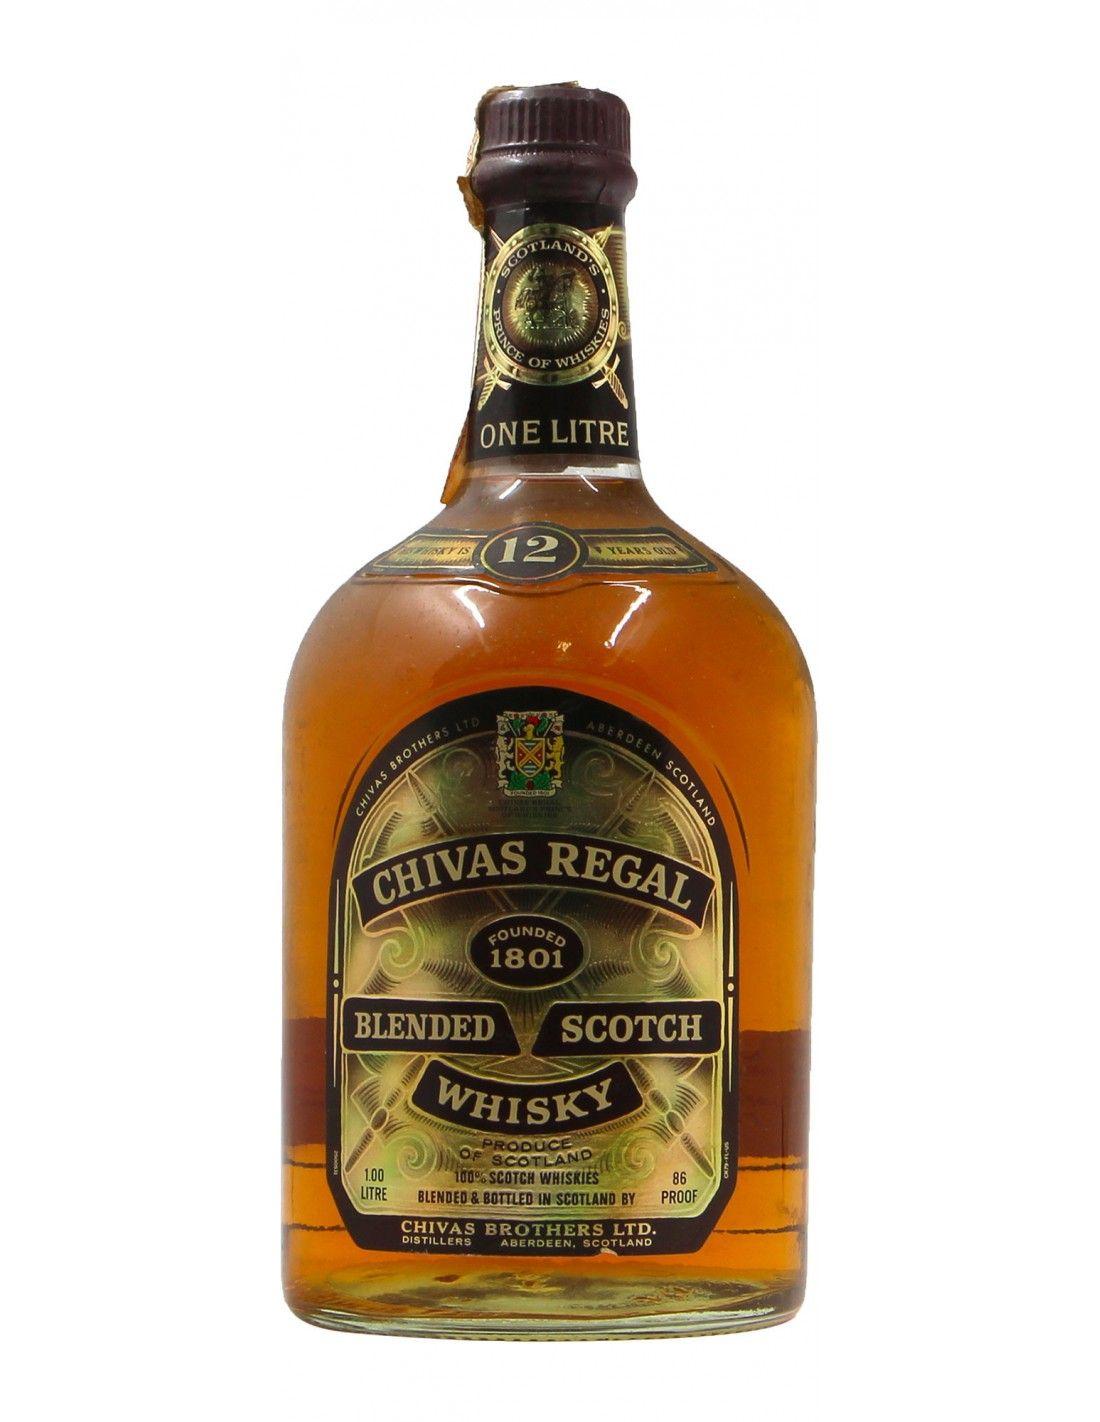 Chivas regal blended scotch whisky 12 YO 100CL NV CHIVAS REGAL Grandi Bottiglie